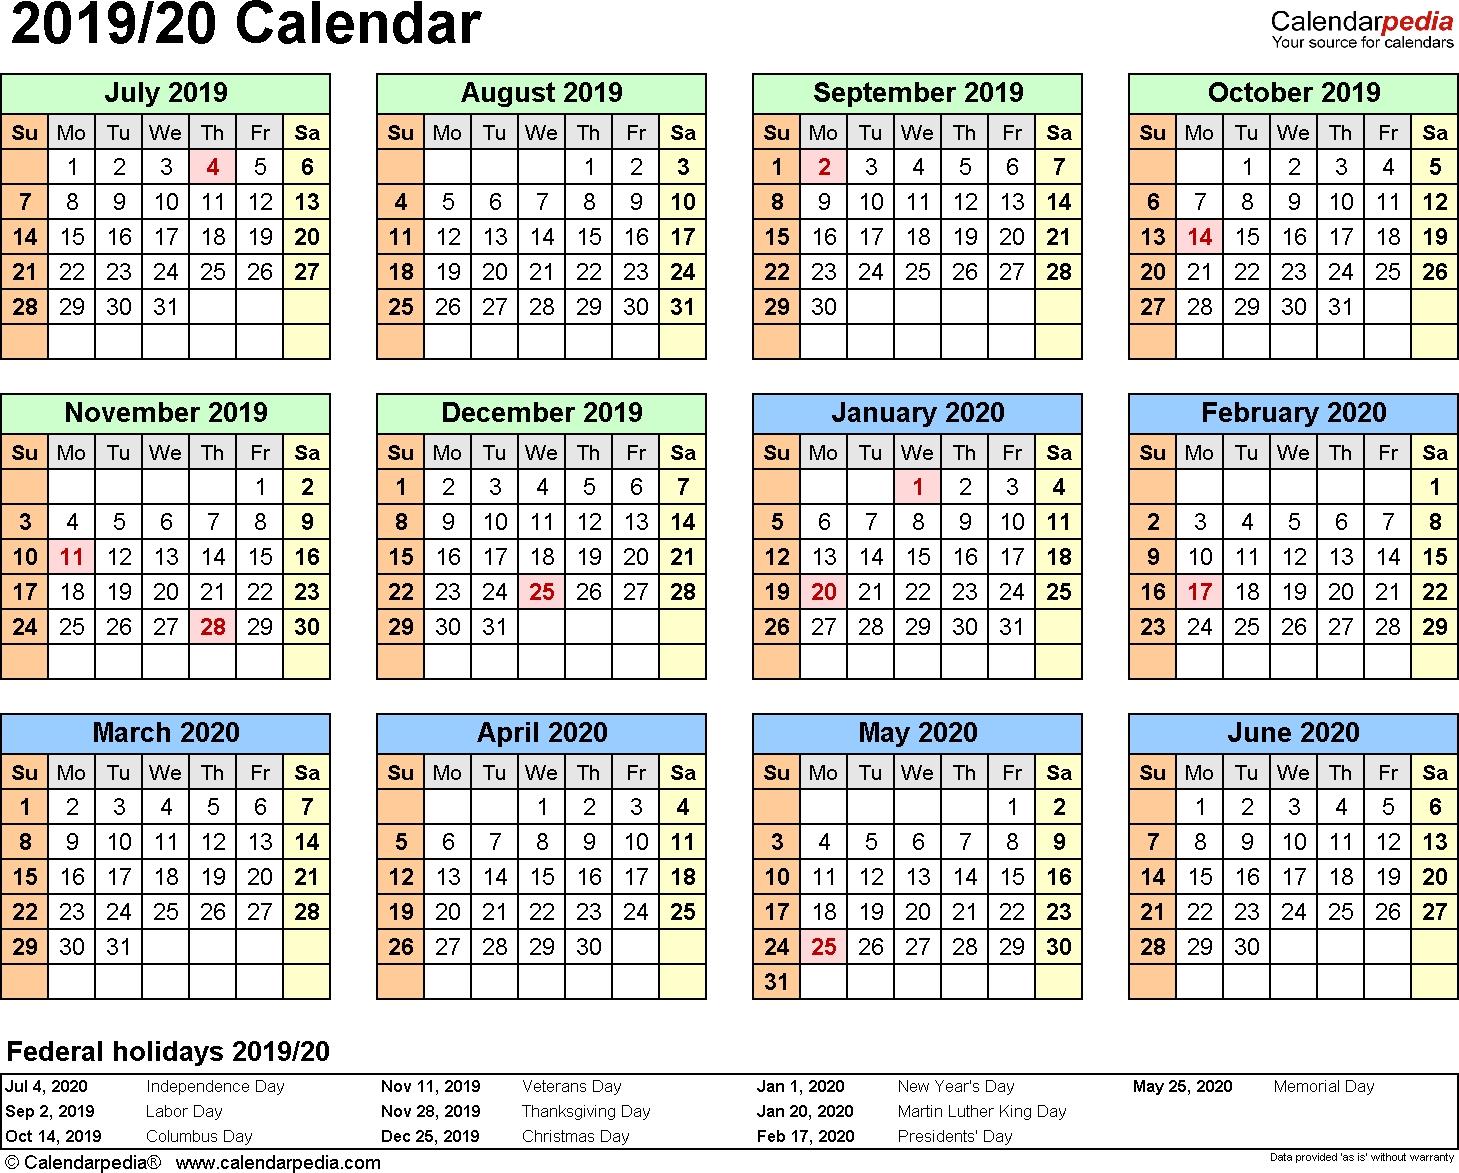 Split Year Calendar 2019/20 (July To June) - Pdf Templates with regard to Financial Week Calendar 2019/2020